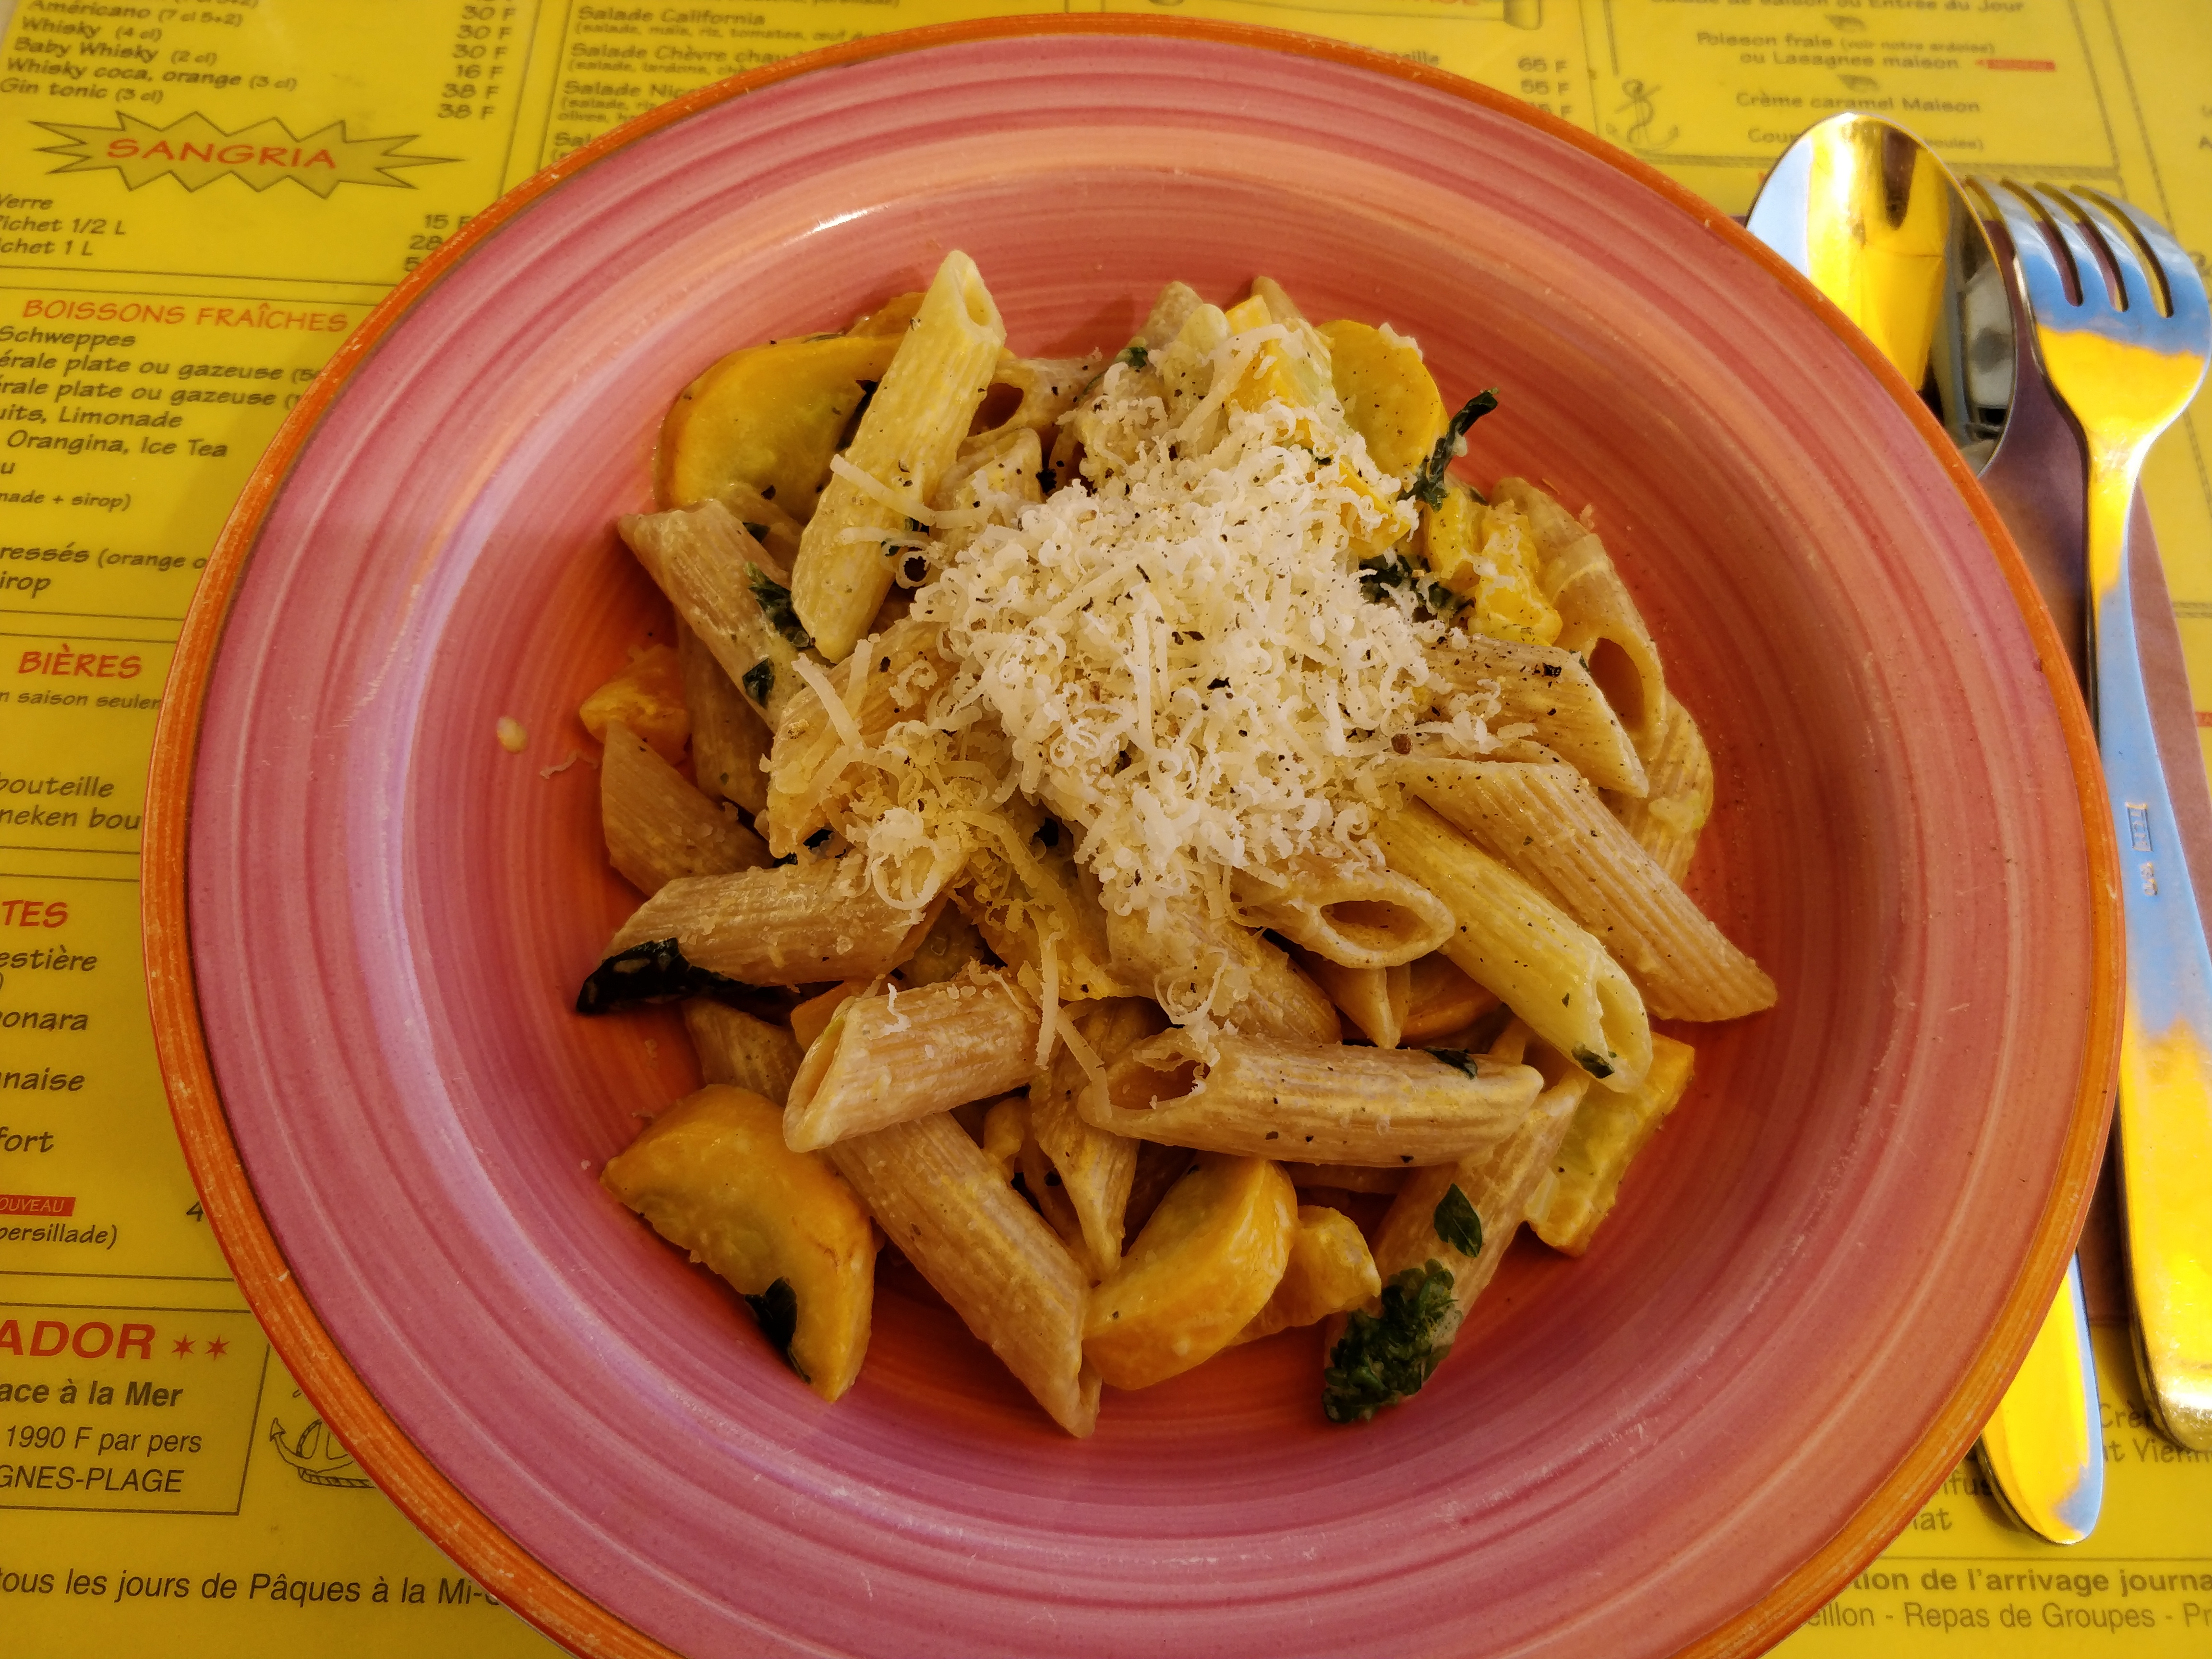 http://foodloader.net/nico_2017-07-29_penne-mit-zucchini-sauce.jpg